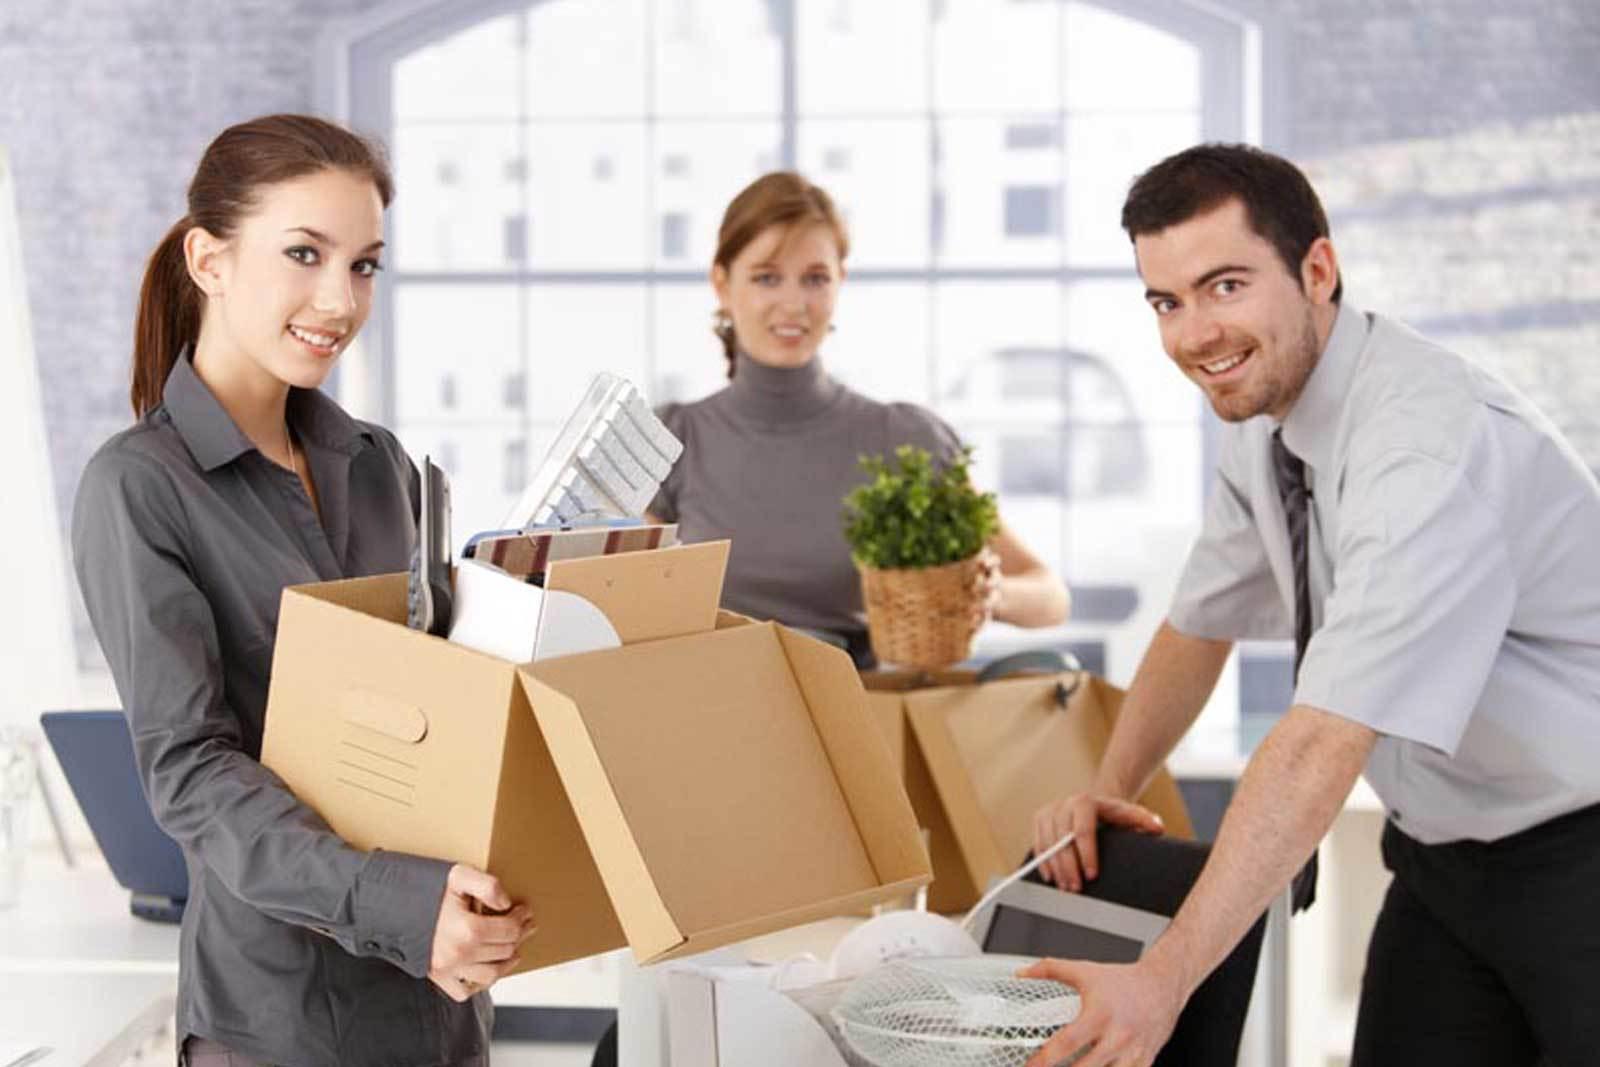 Removalists Waverley - The Help You Need